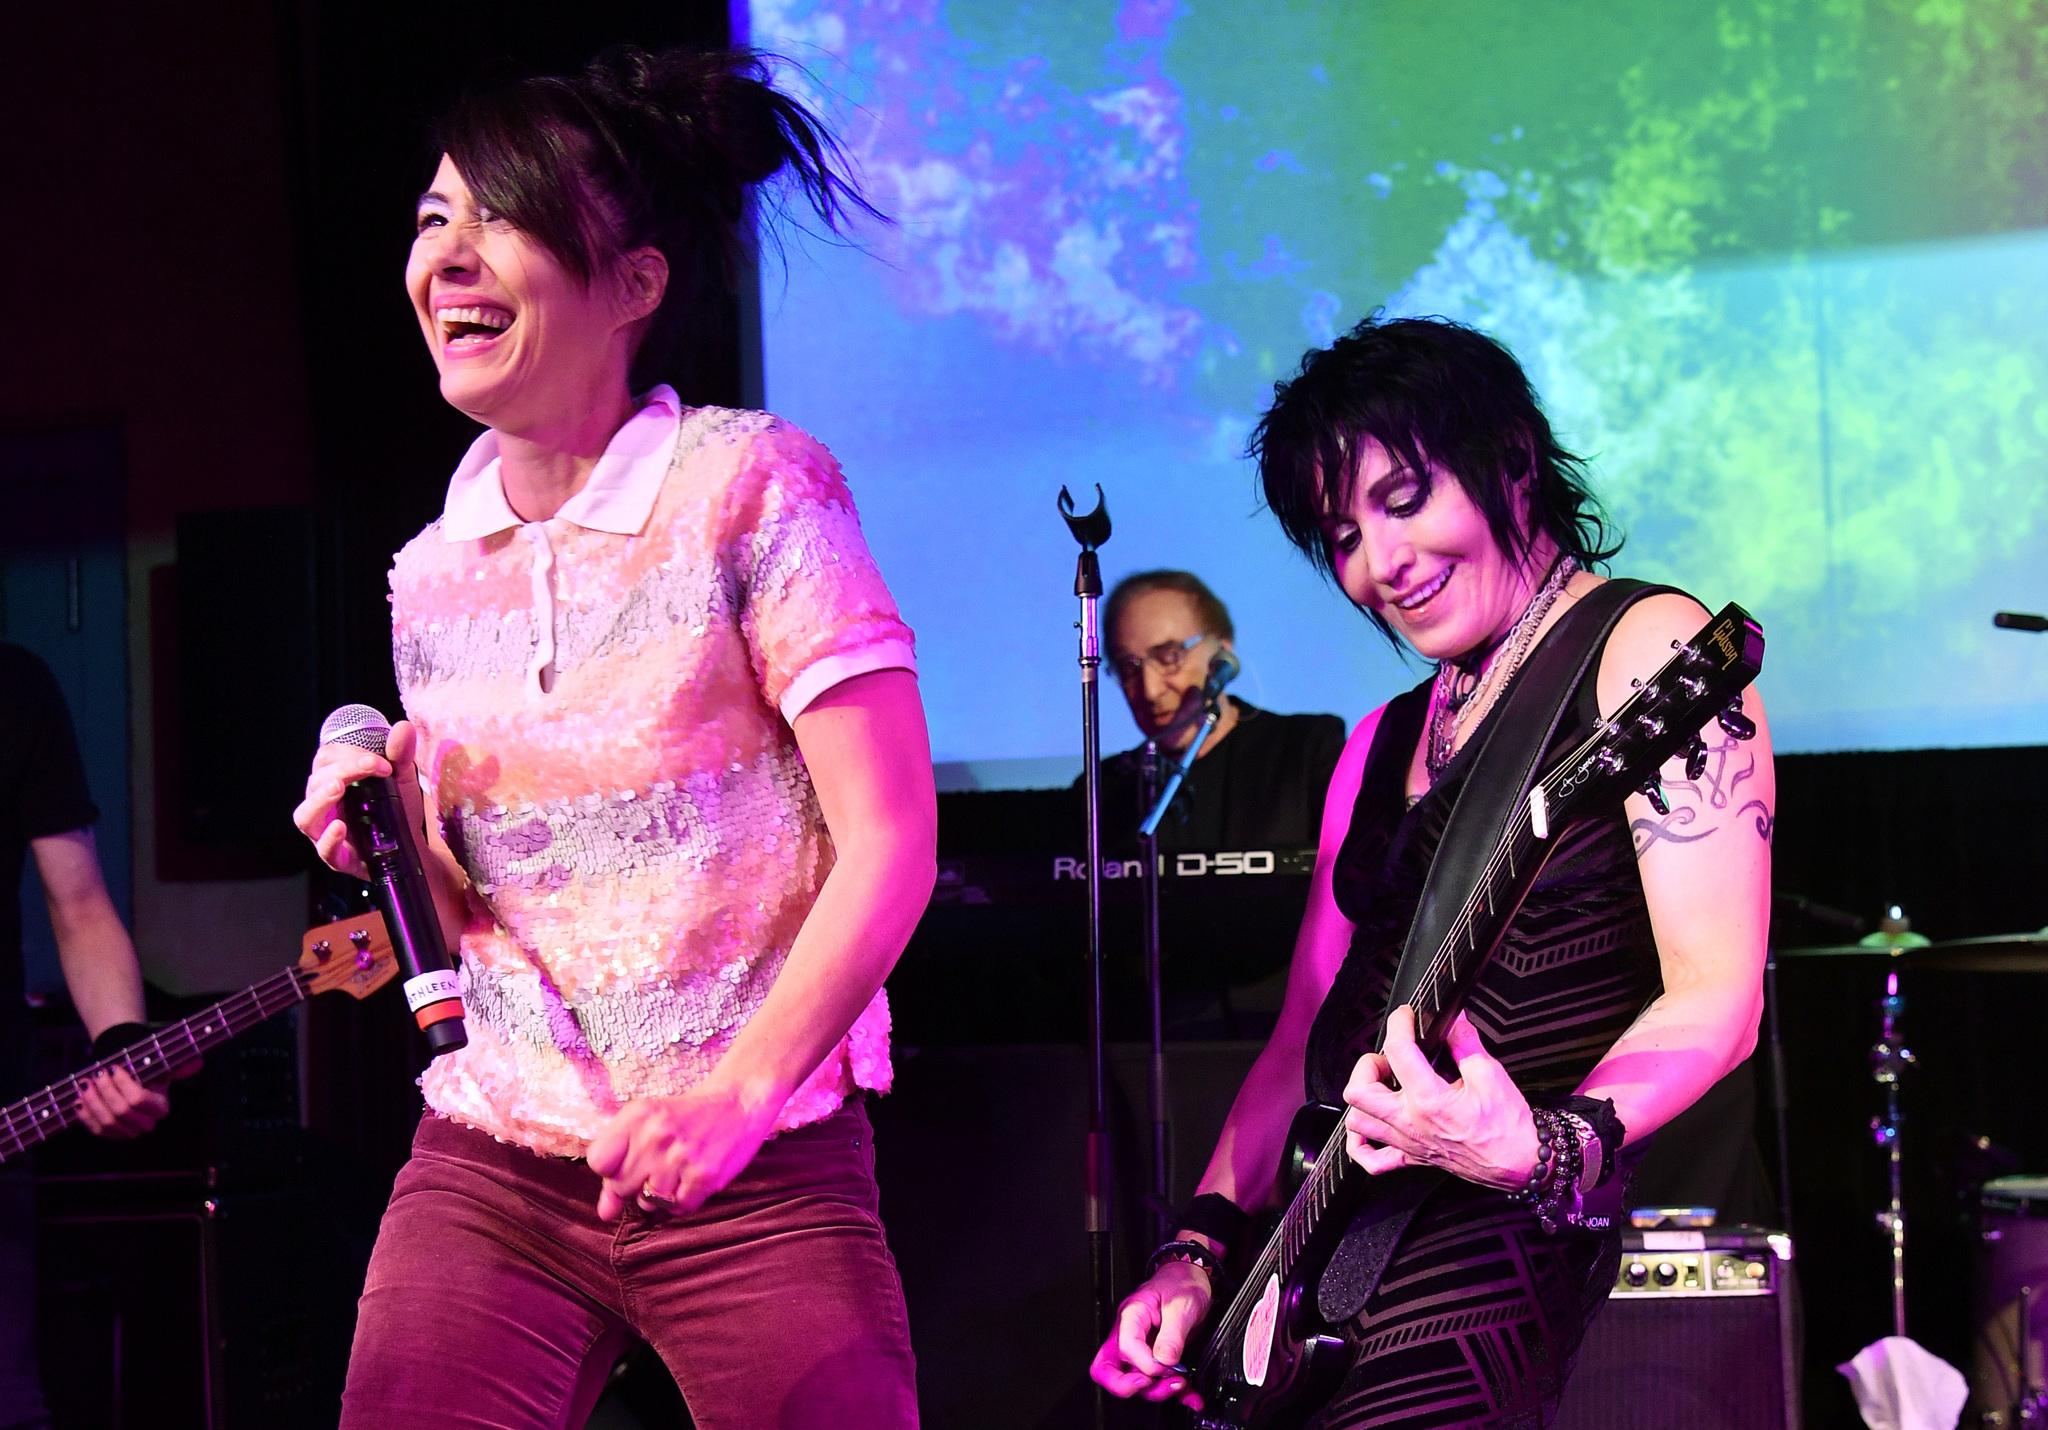 Joan Jett, Kathleen Hanna, and Kenny Laguna at an event for Bad Reputation (2018)